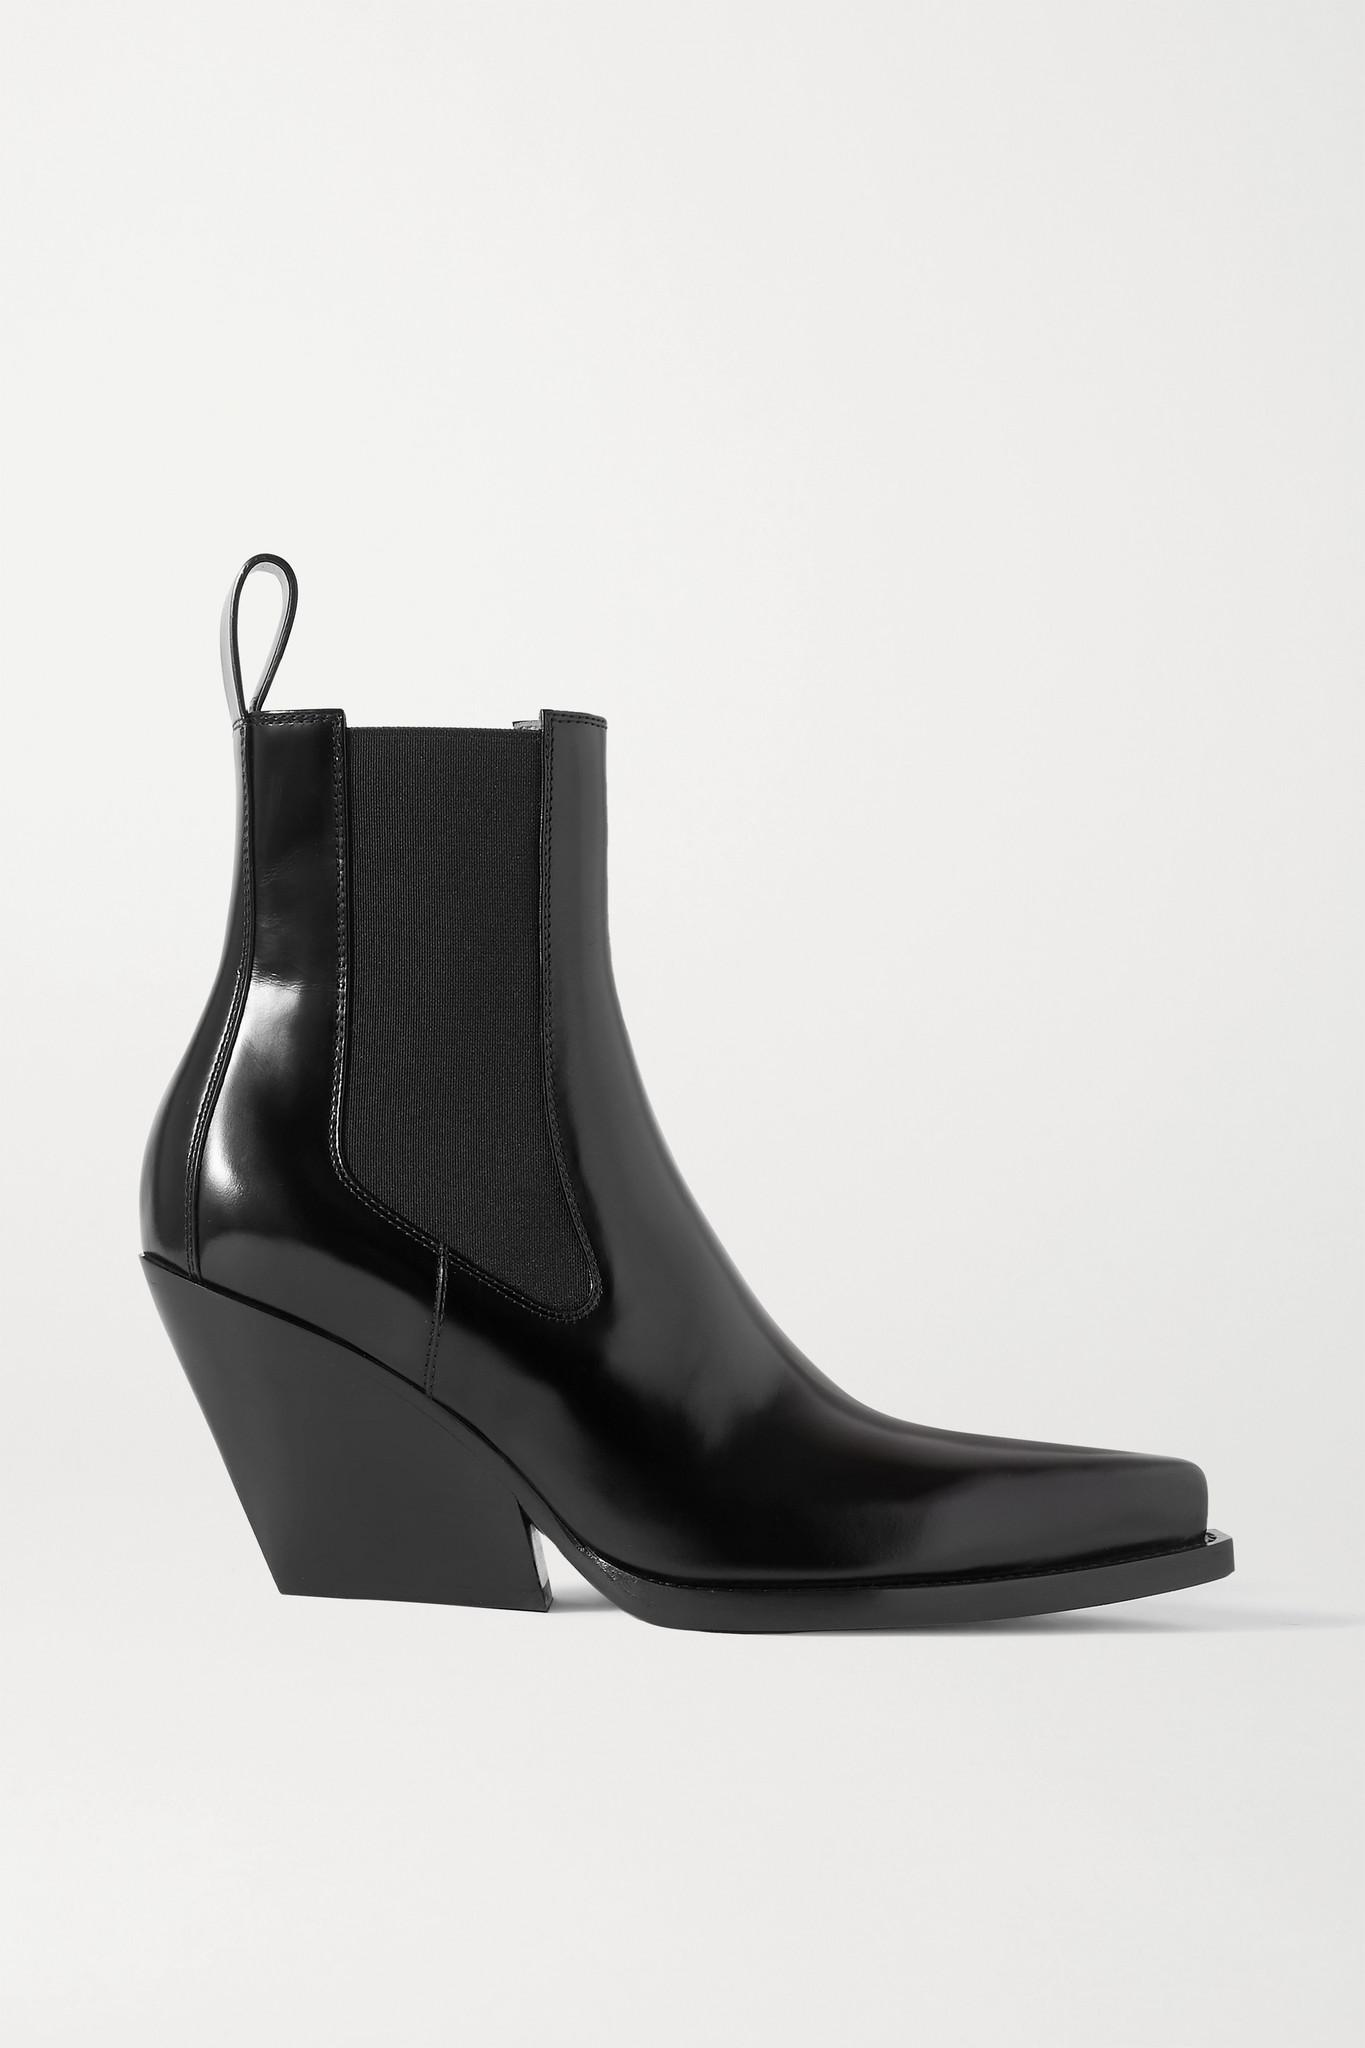 BOTTEGA VENETA - 亮面皮革踝靴 - 黑色 - IT36